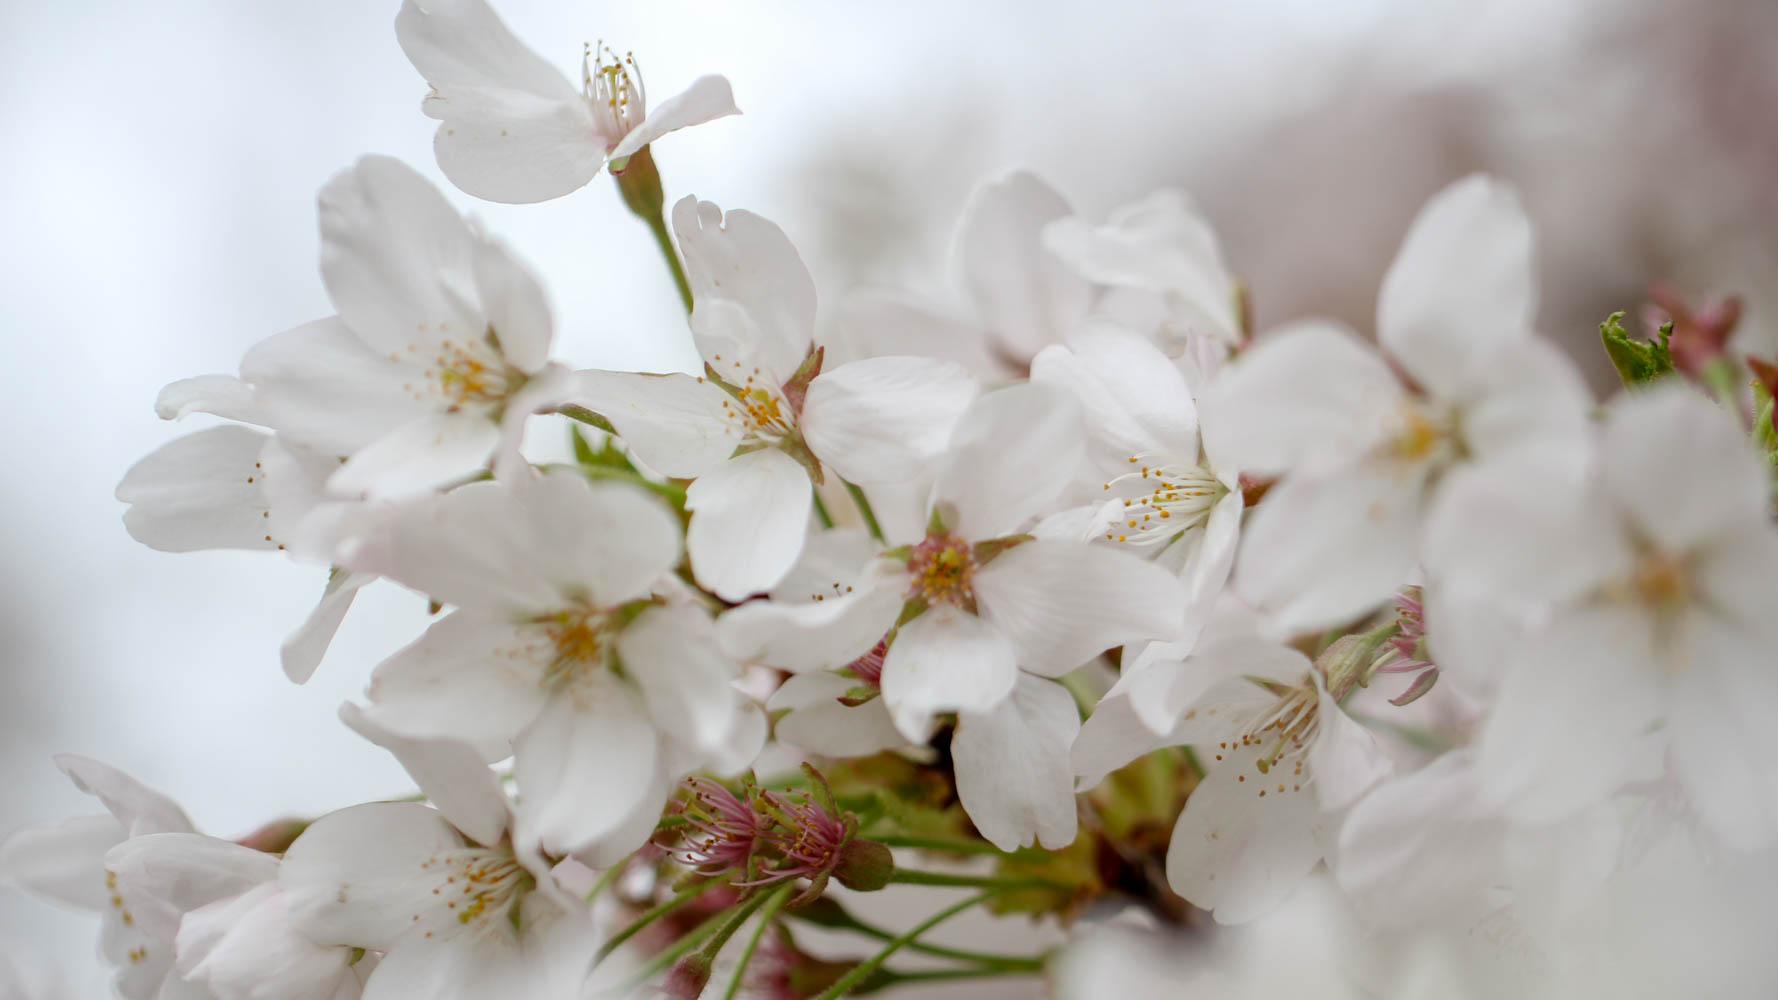 The Cherry Blossom Festival Norah Alhareky Photography Sp18